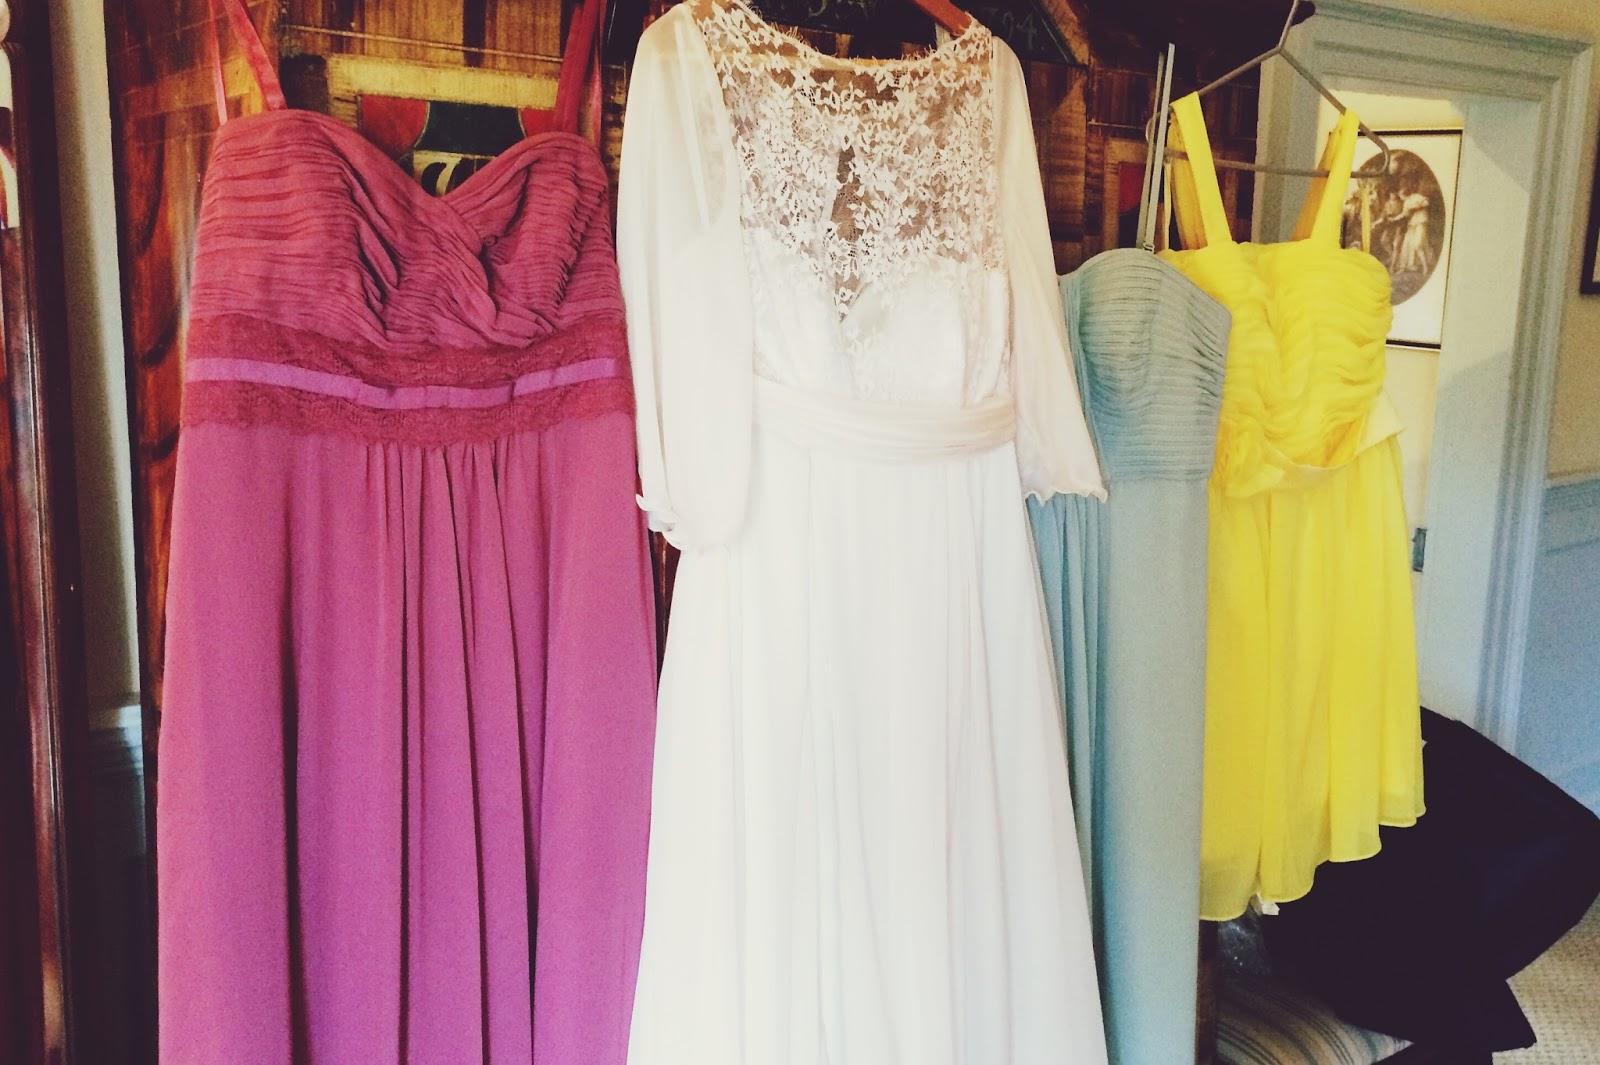 Wedding dress with bridesmaids dresses - rustic wedding inspiration